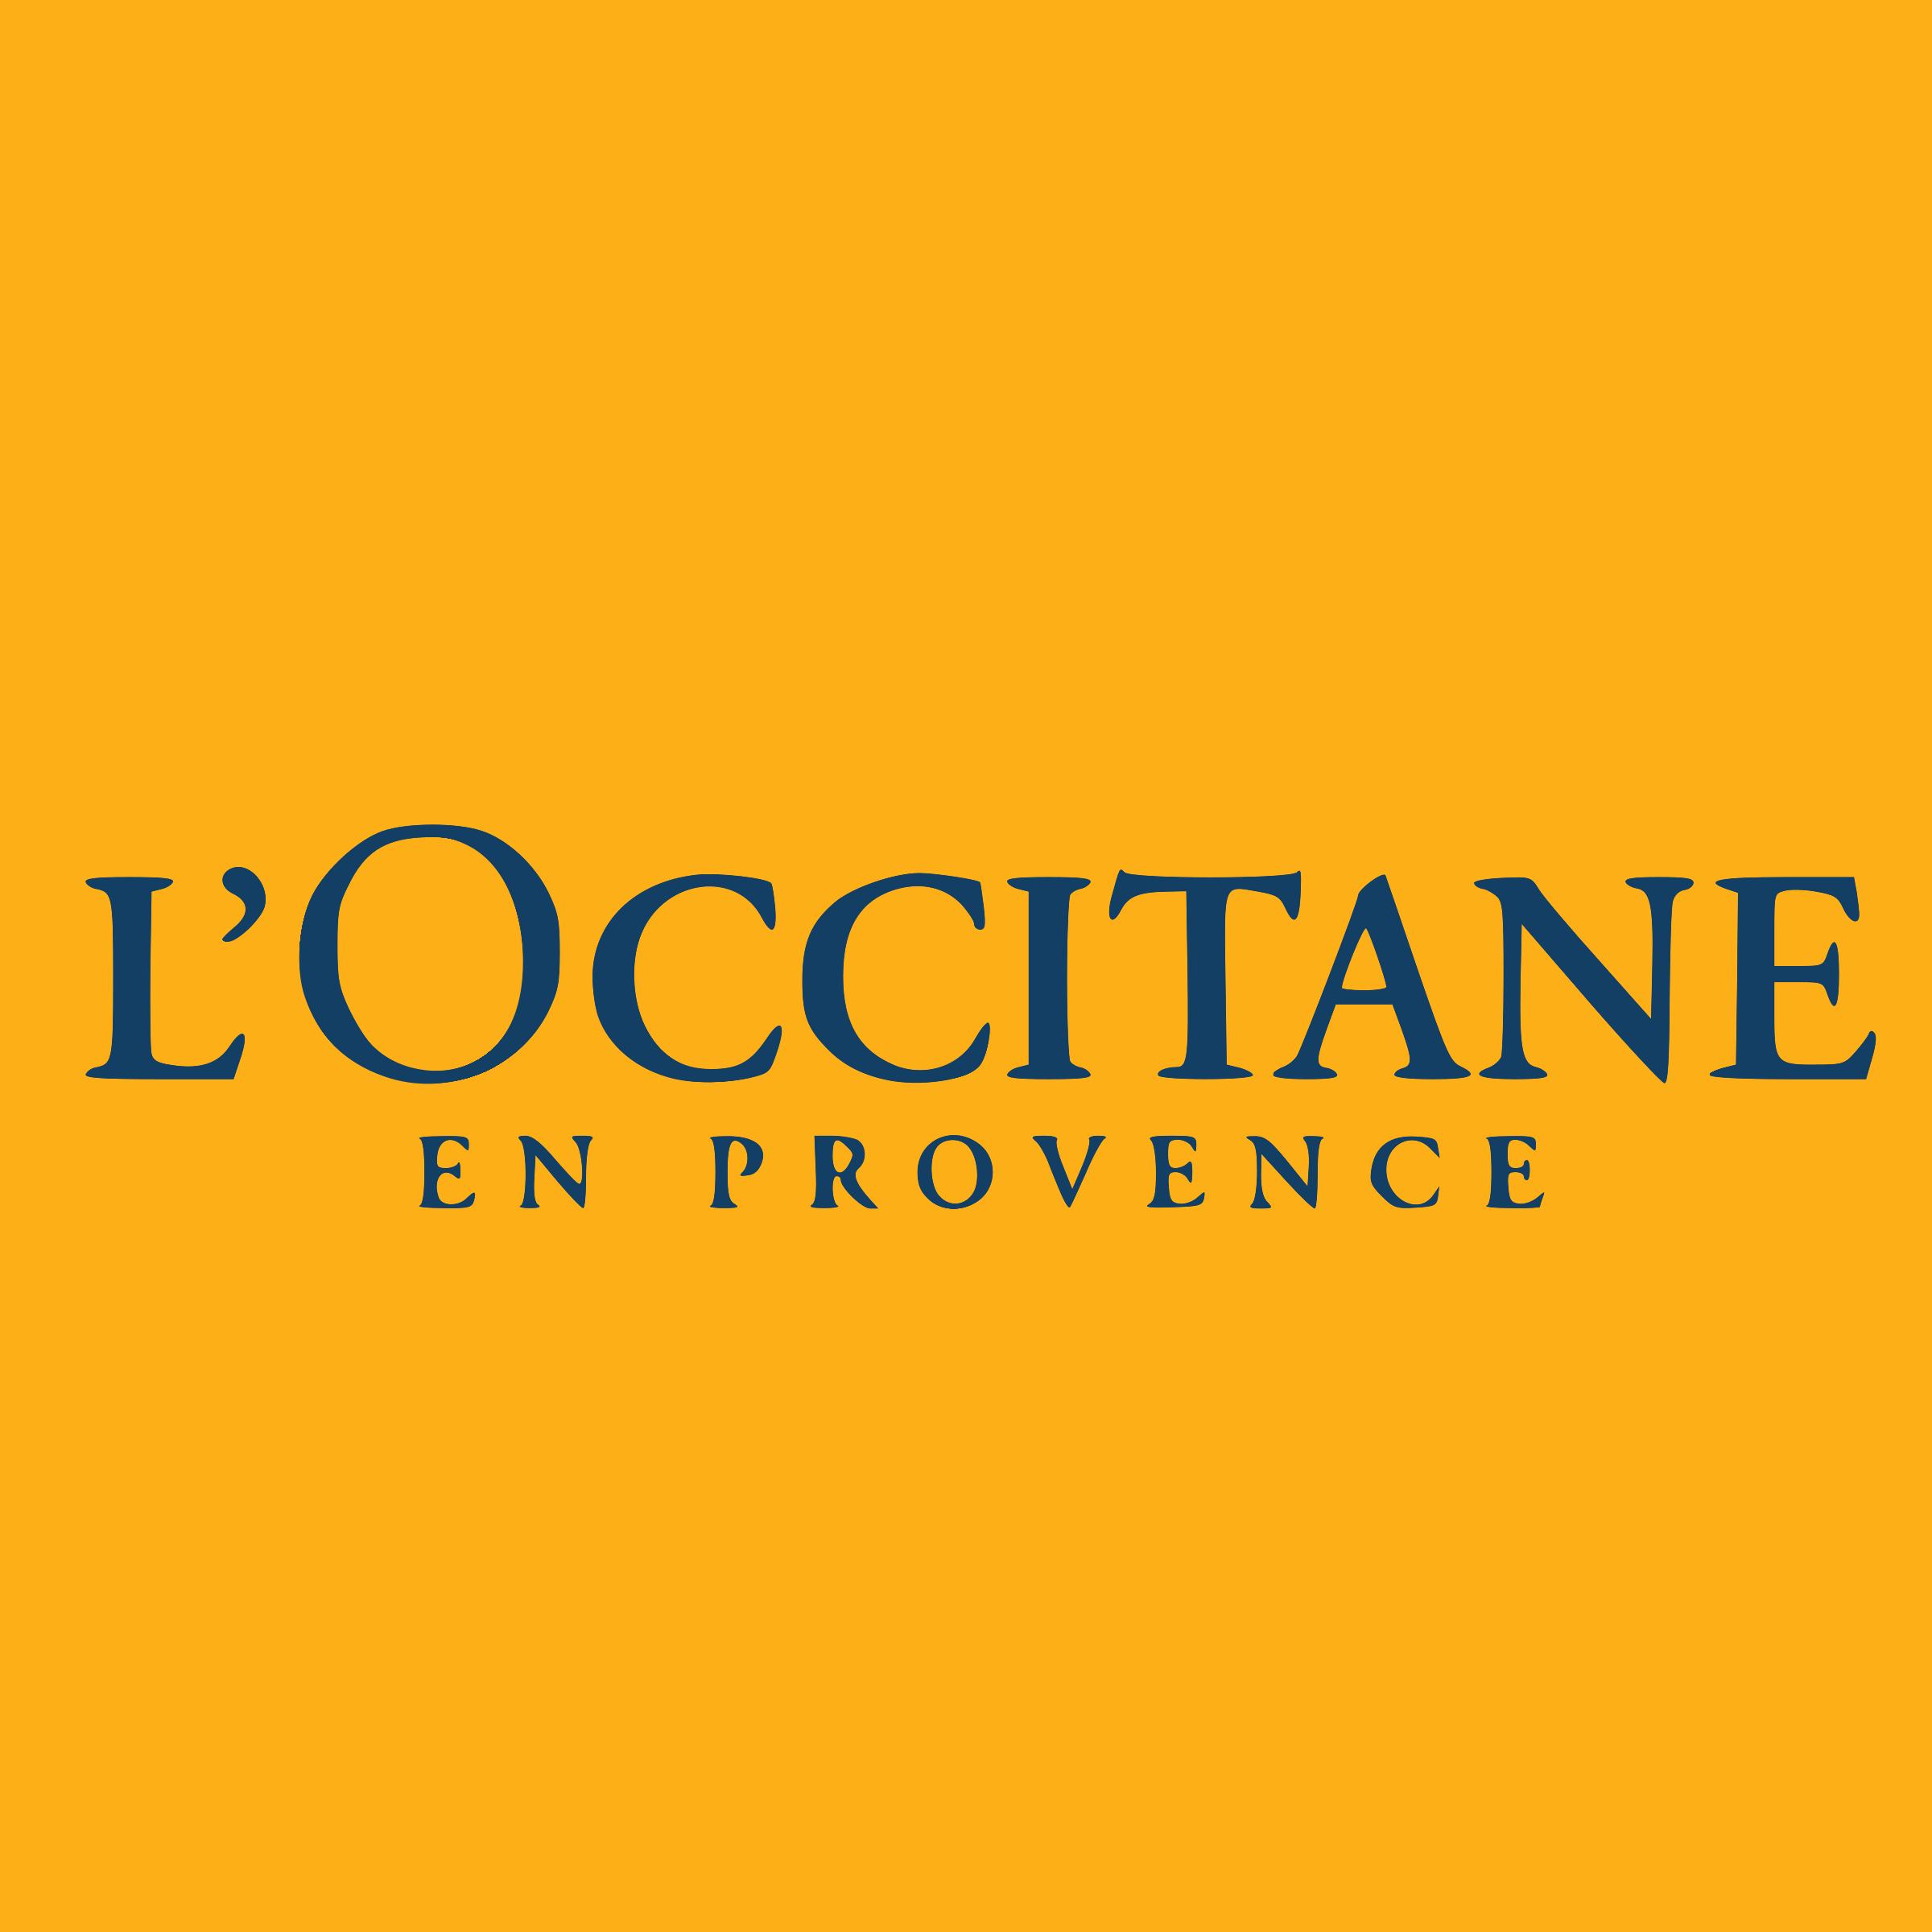 L'Occitane.png